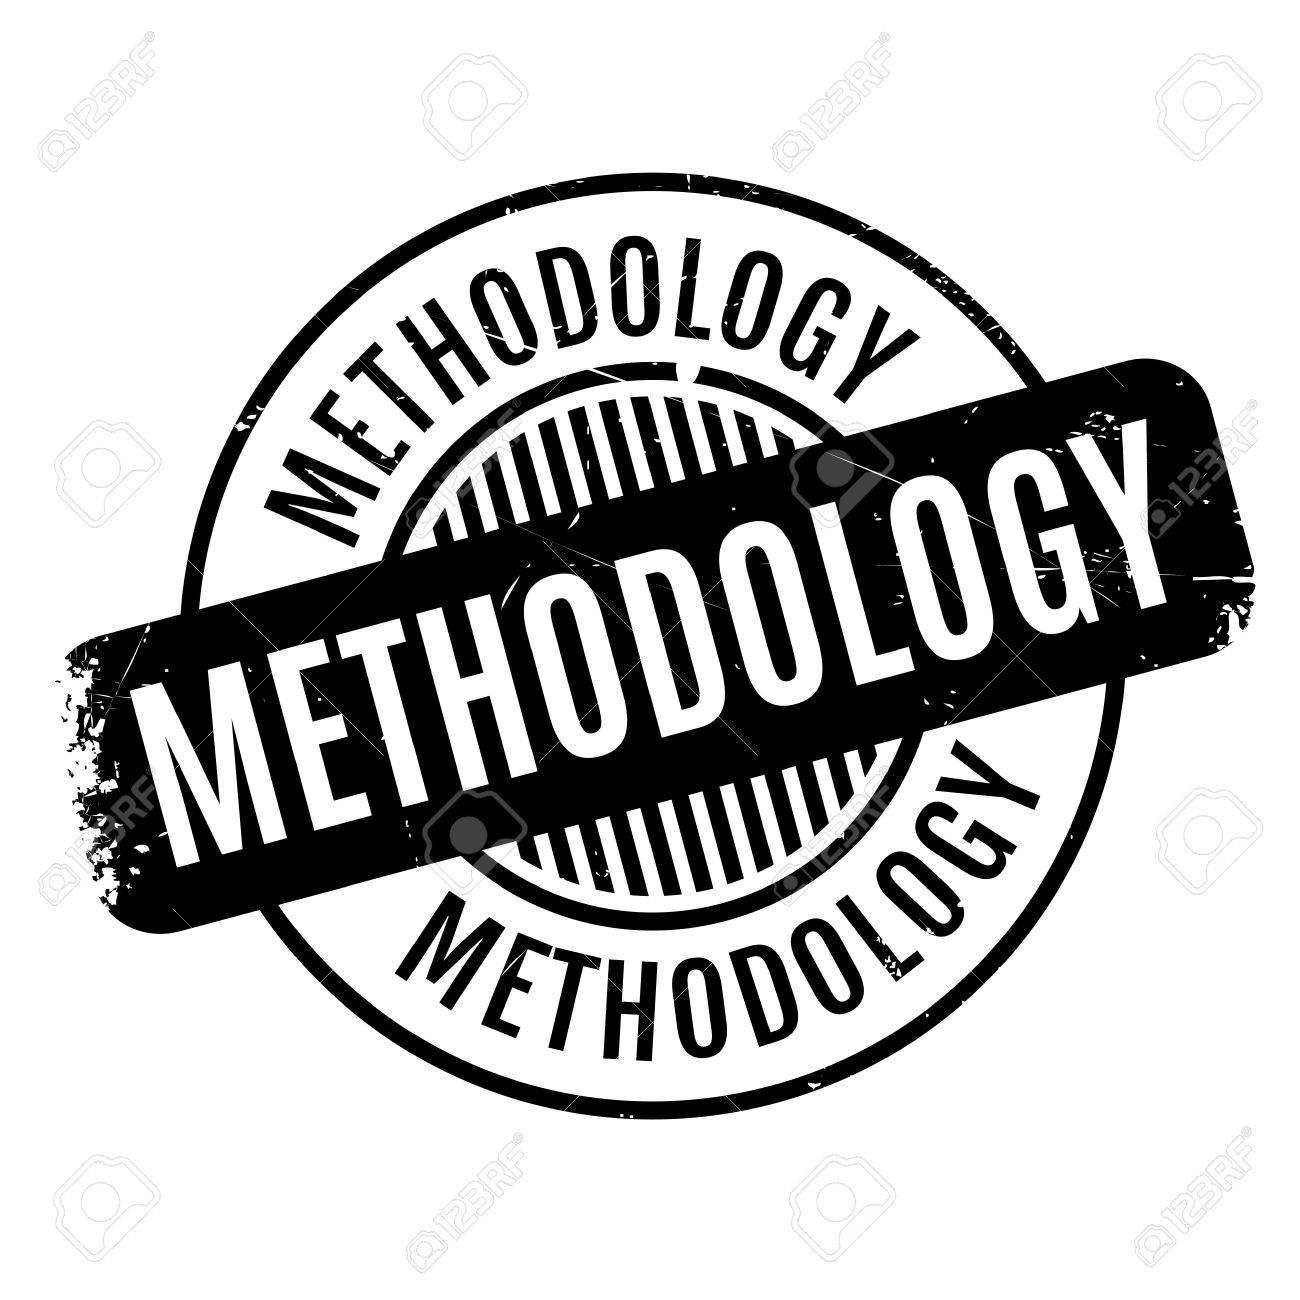 Methodology rubber stamp.